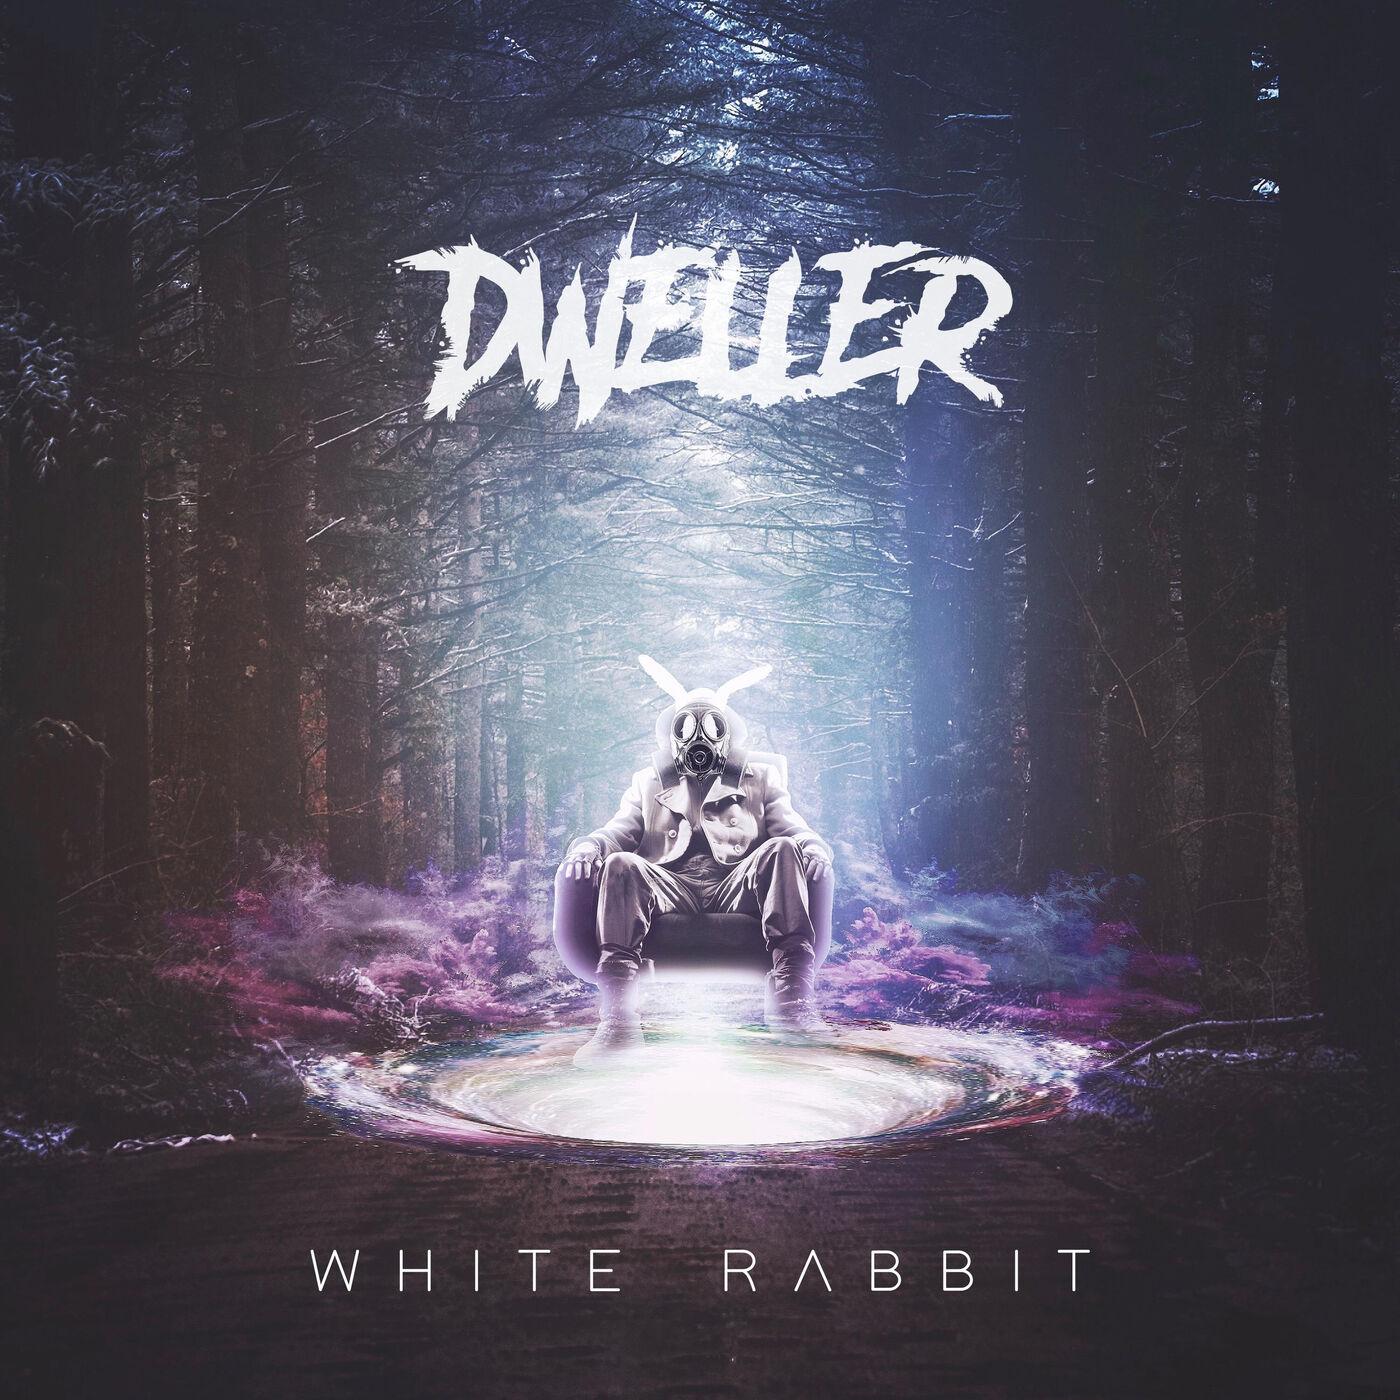 Dweller - White Rabbit [EP] (2020)